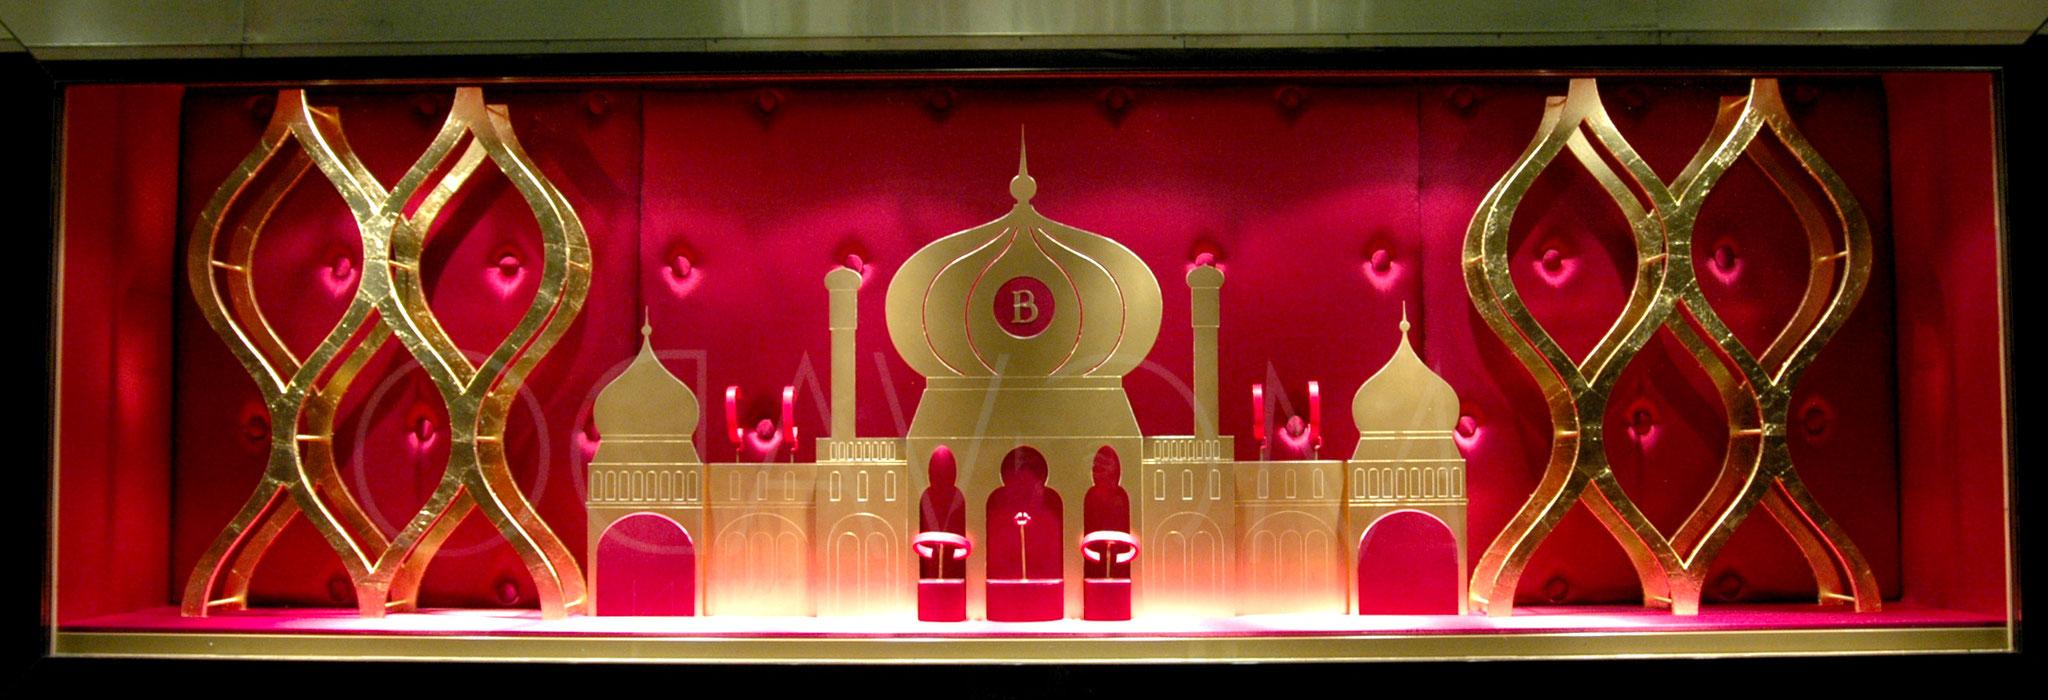 PLV BOUCHERON salon Bâle / exotisme